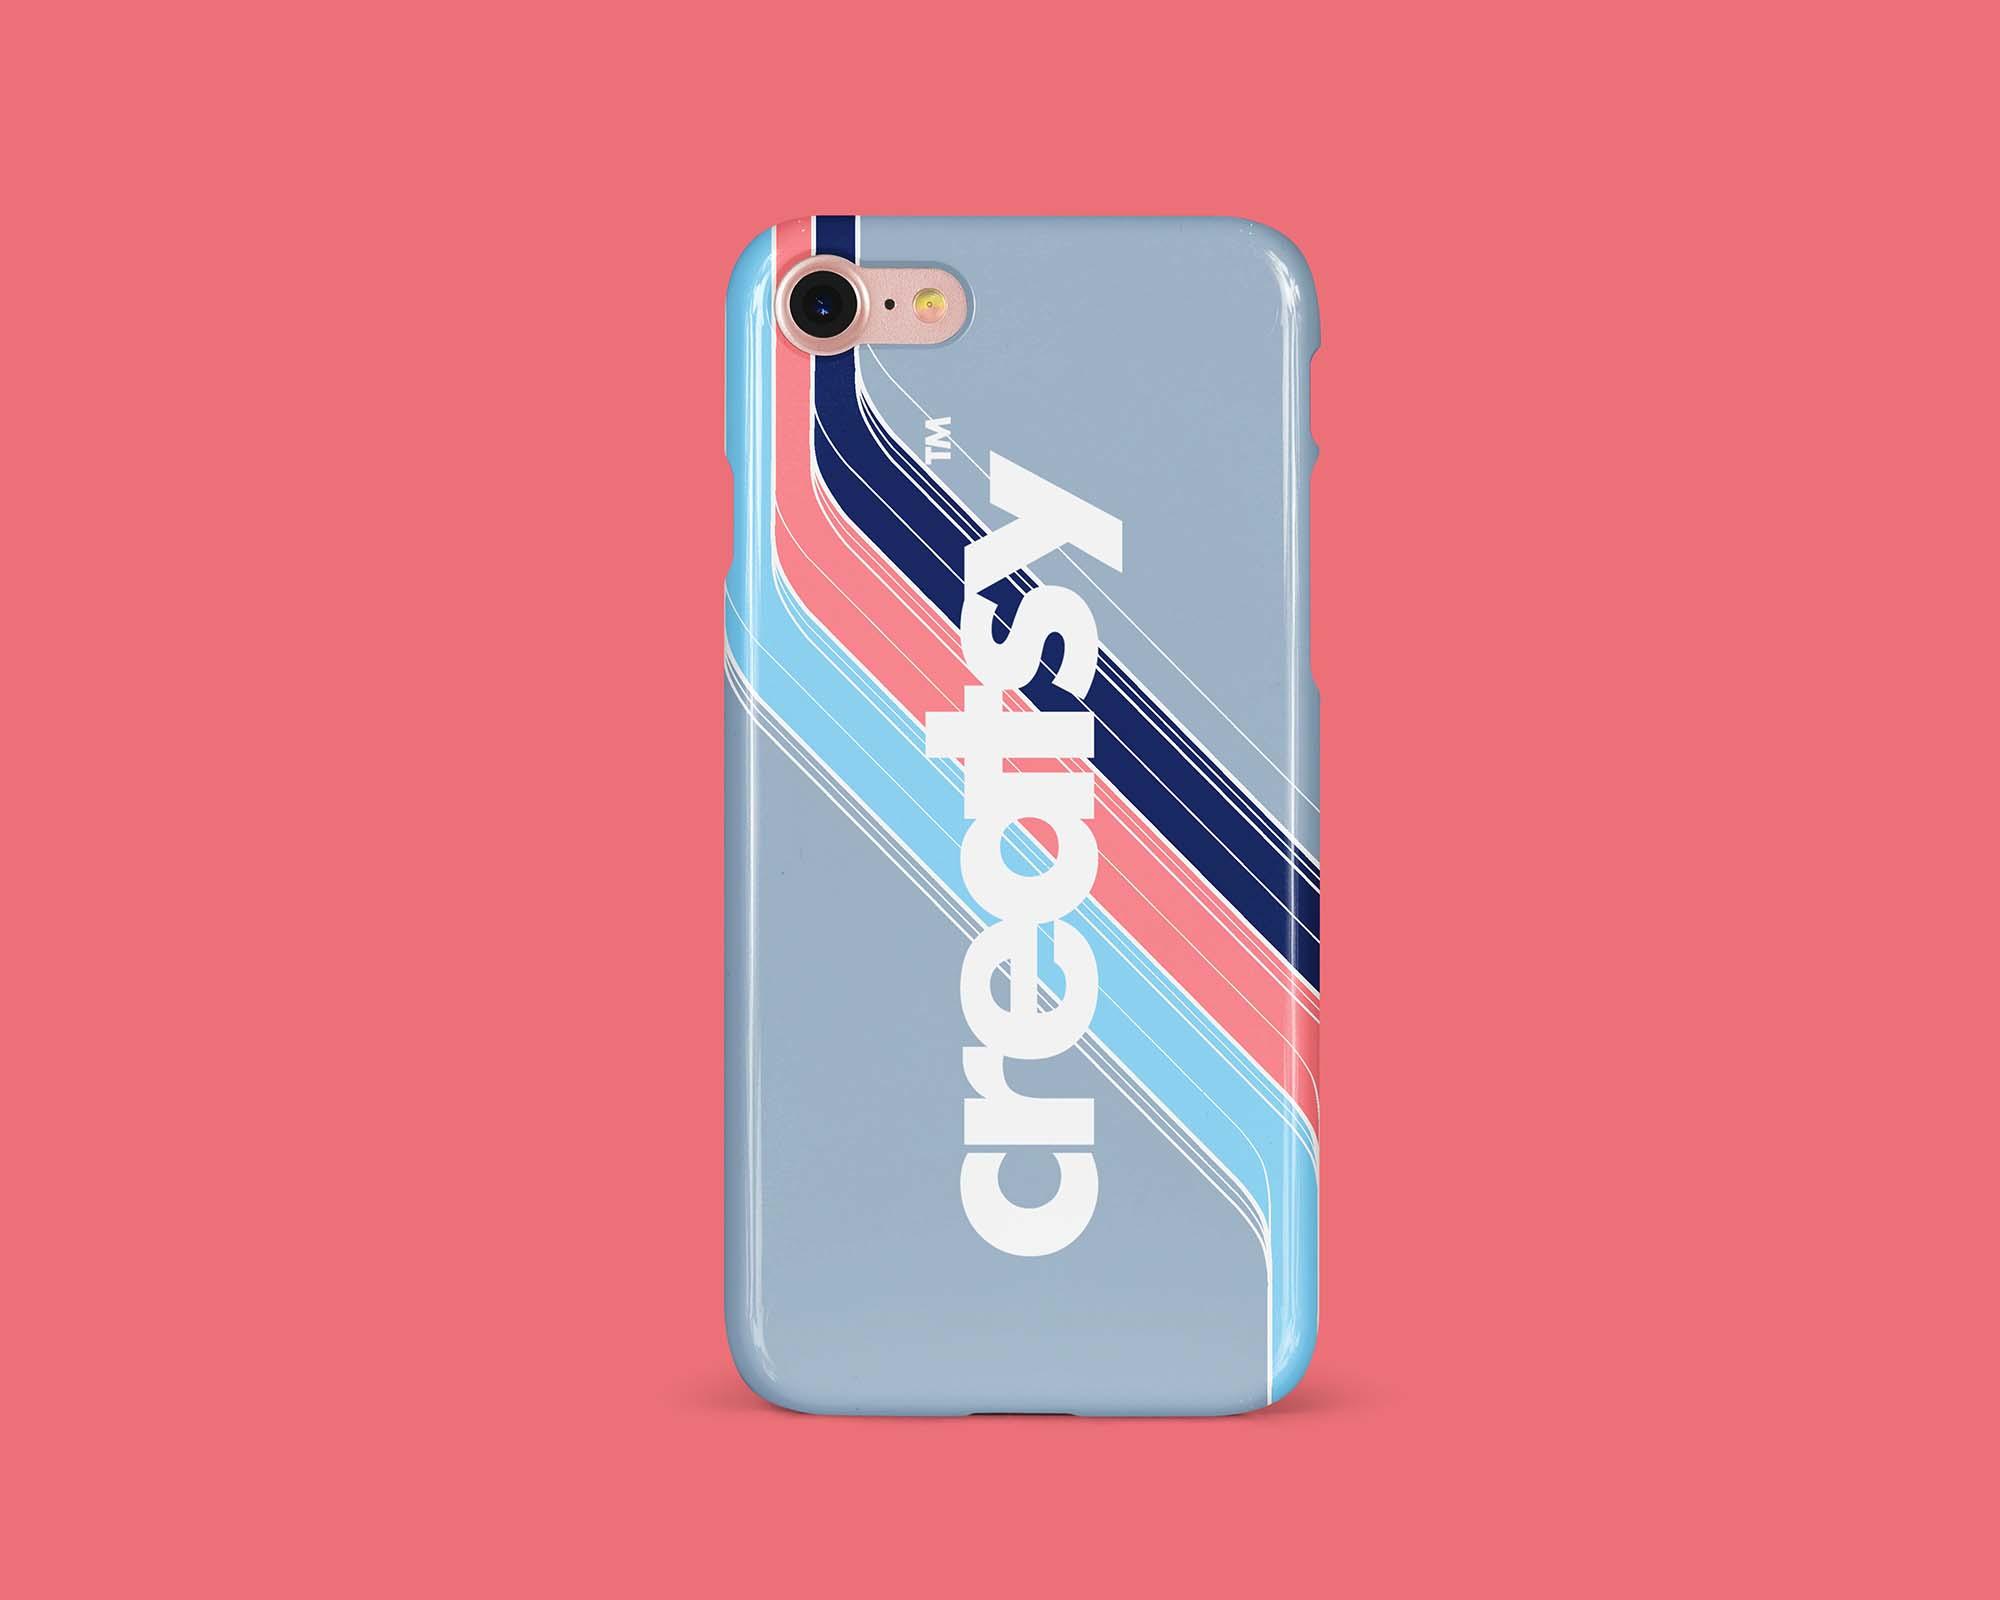 iPhone Glossy Case Mockup